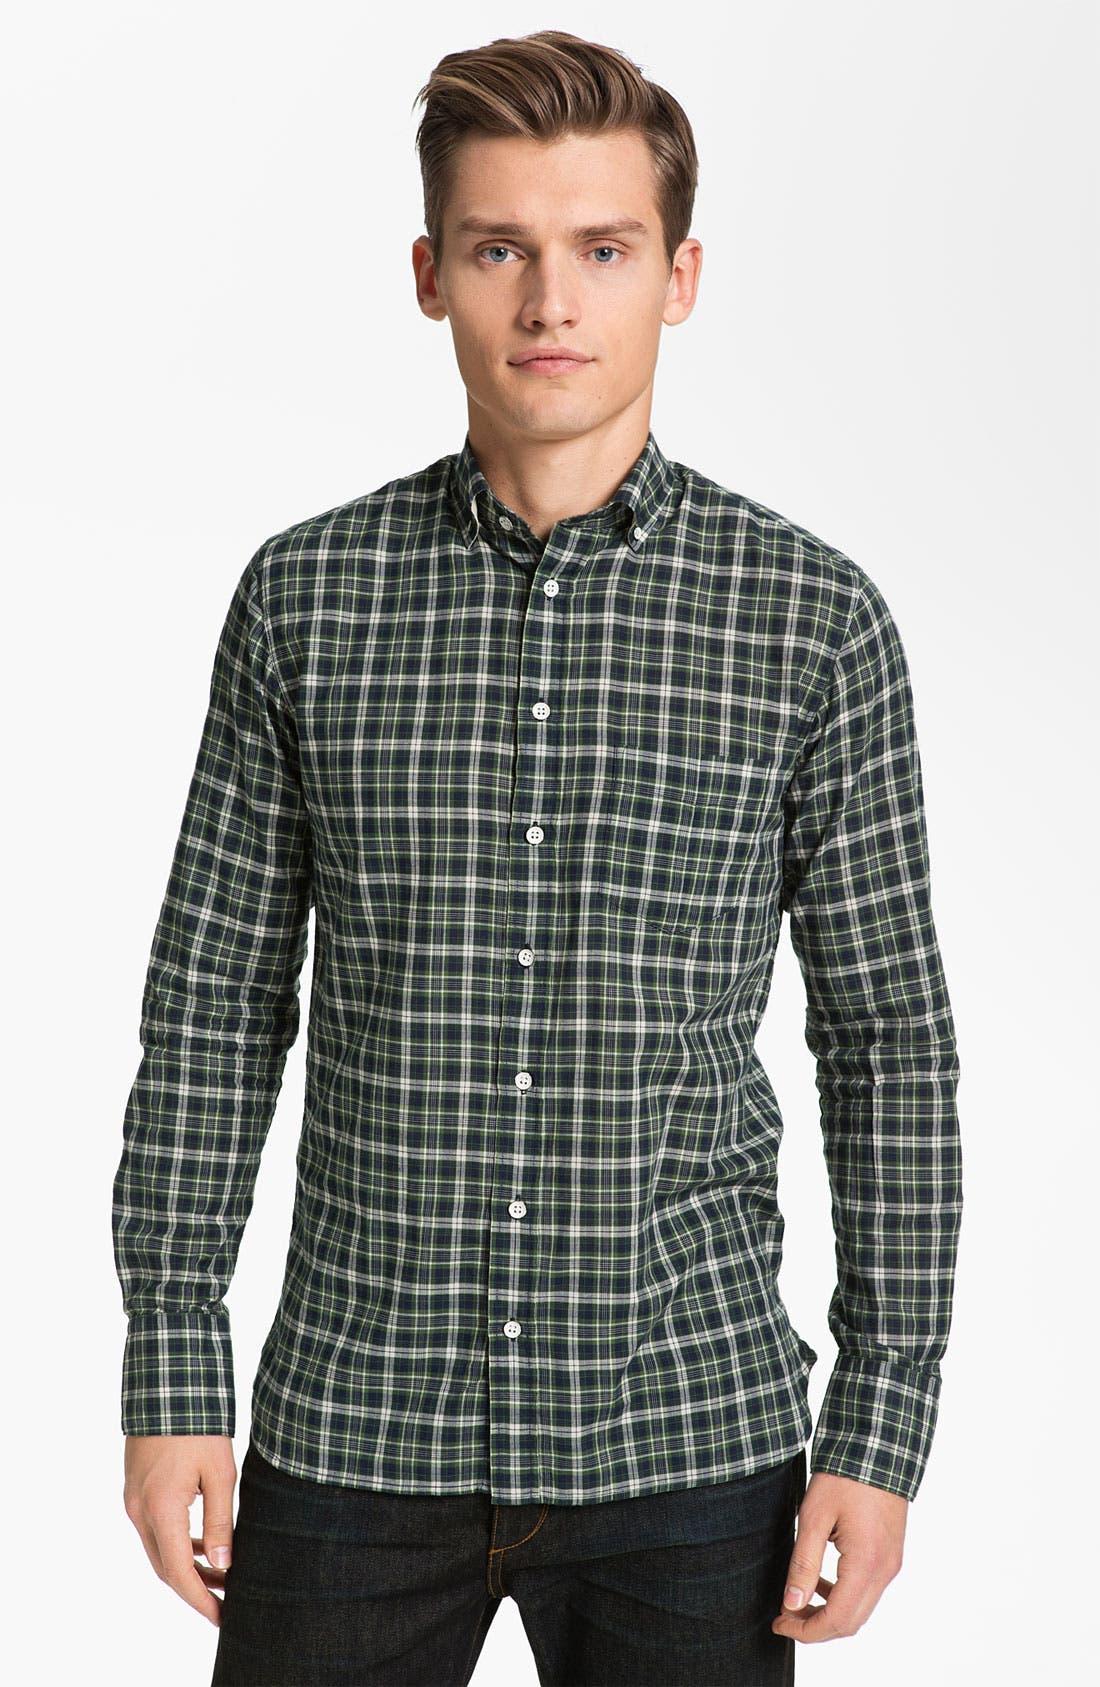 Alternate Image 1 Selected - rag & bone Plaid Oxford Shirt